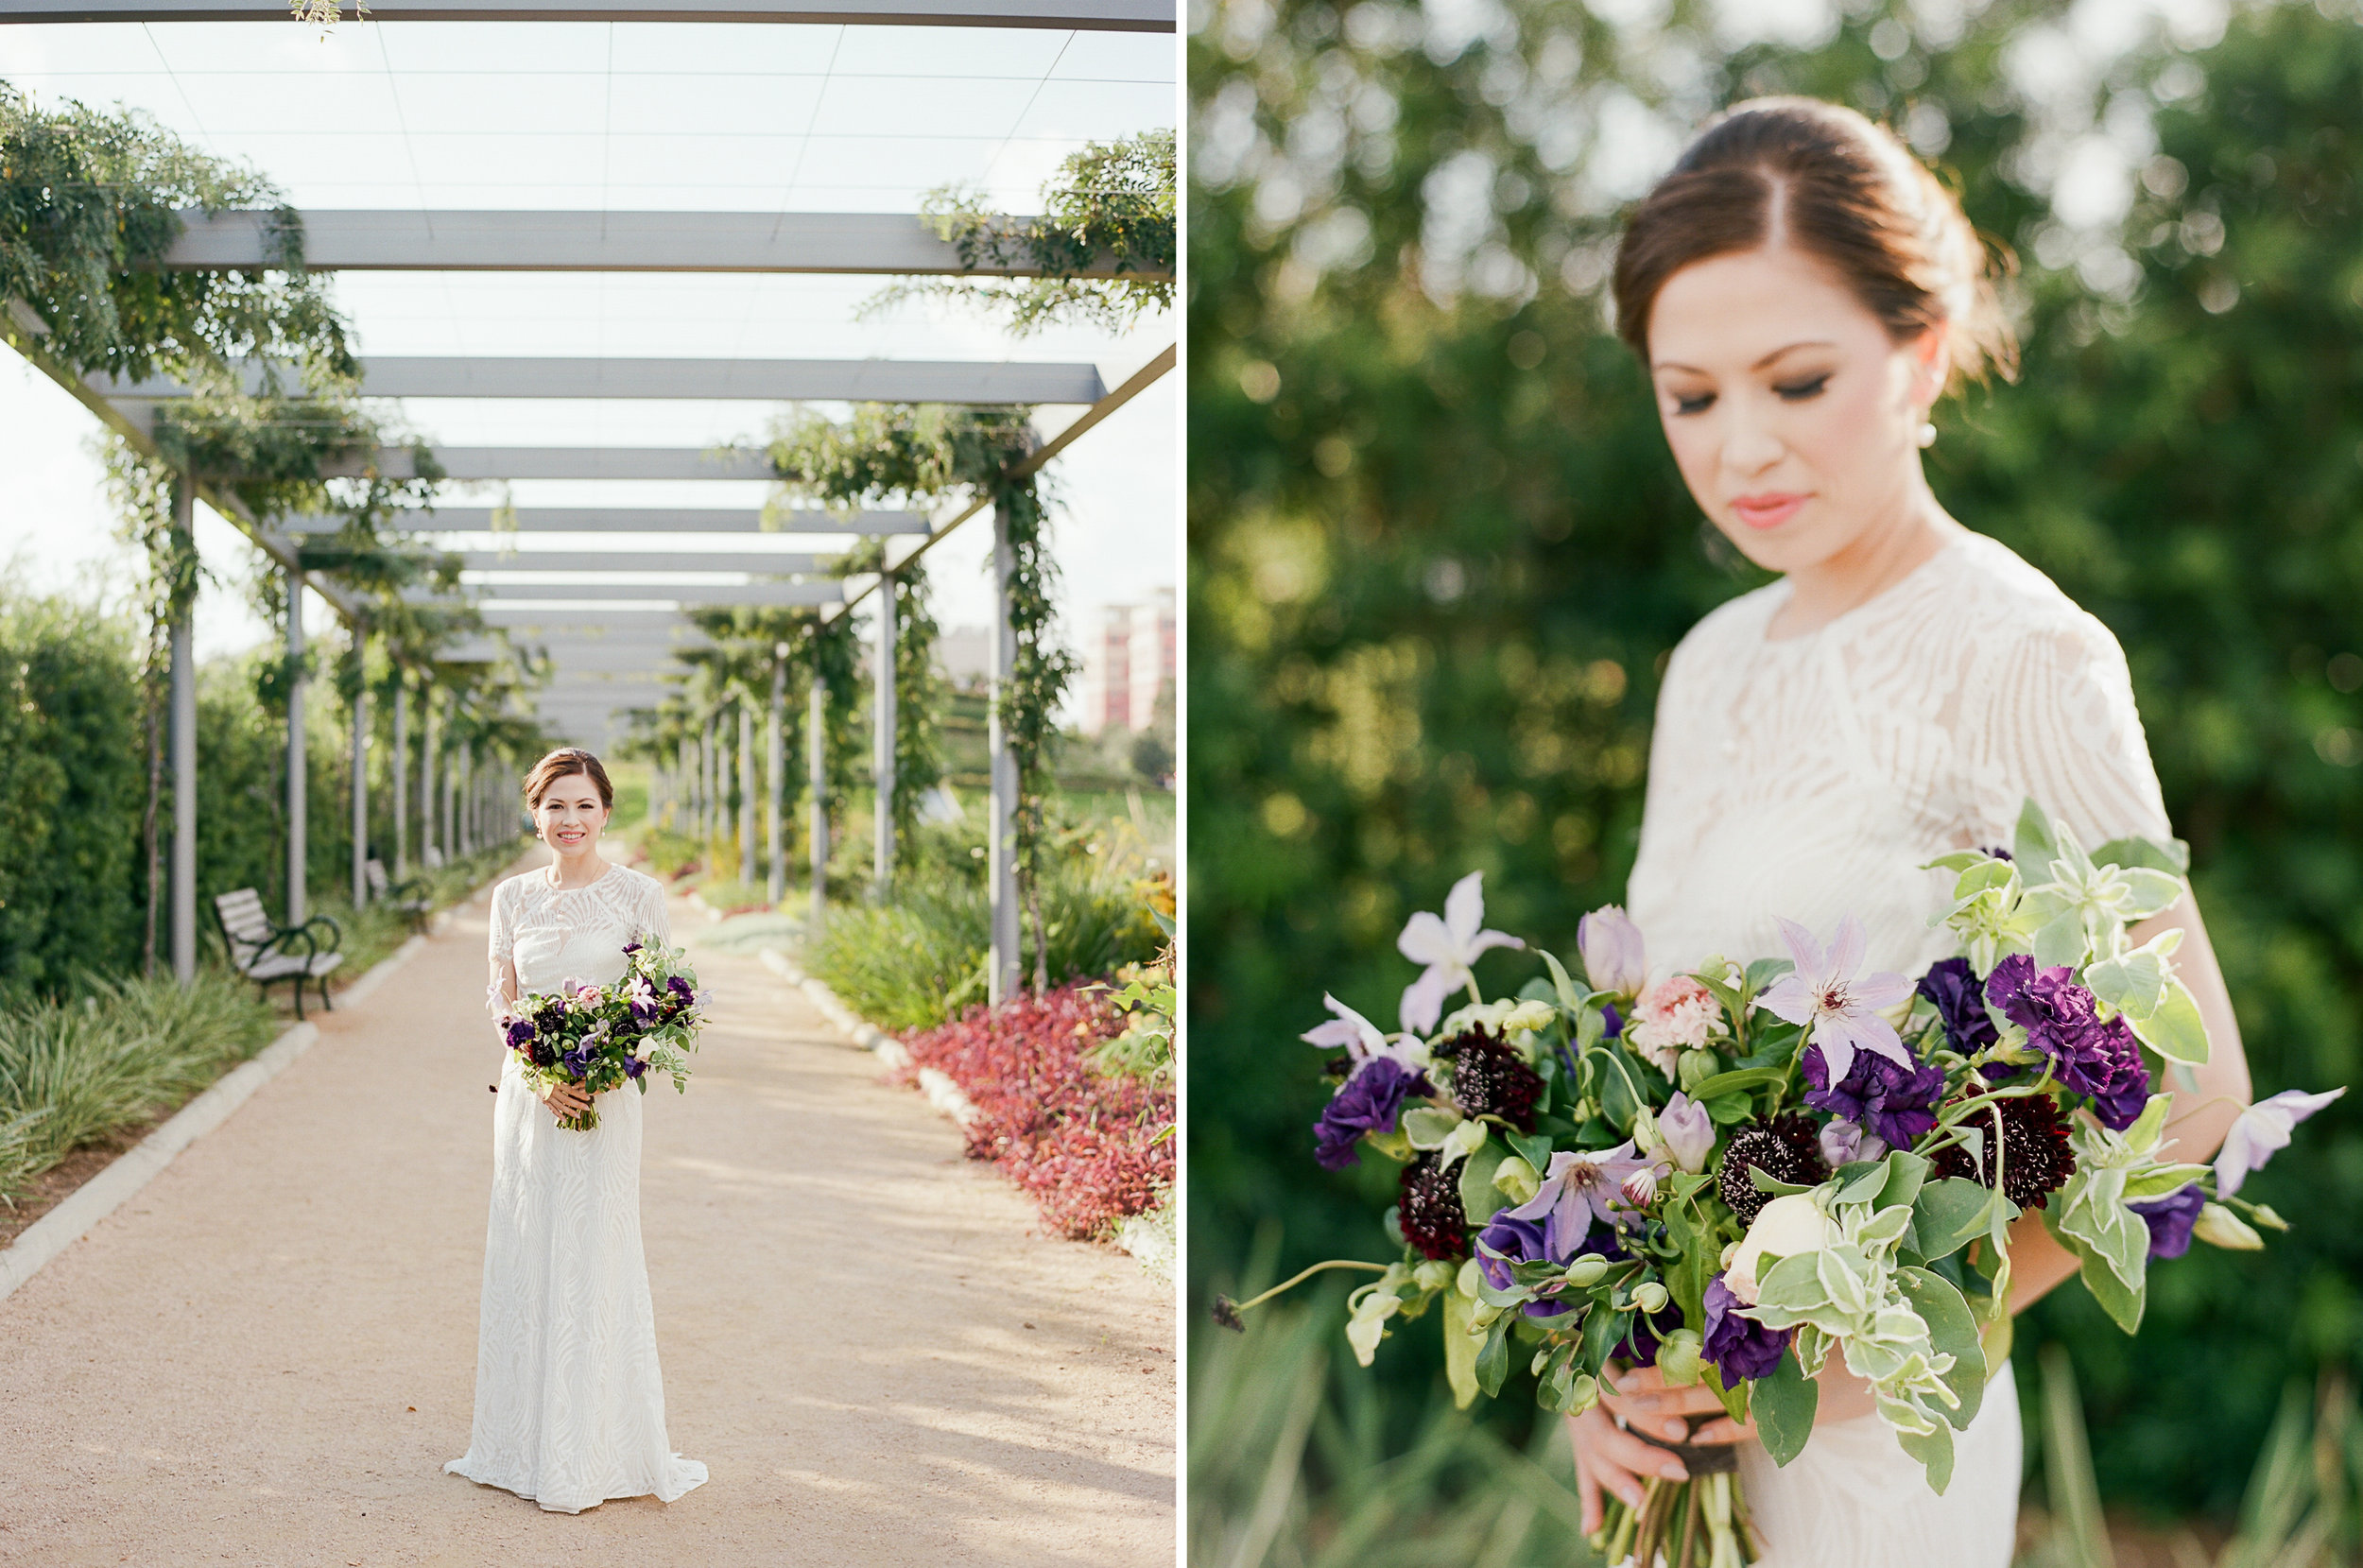 mcgovern-centennial-gardens-wedding-houston-wedding-photographer-bridals-film-austin-wedding-photographer-110.jpg